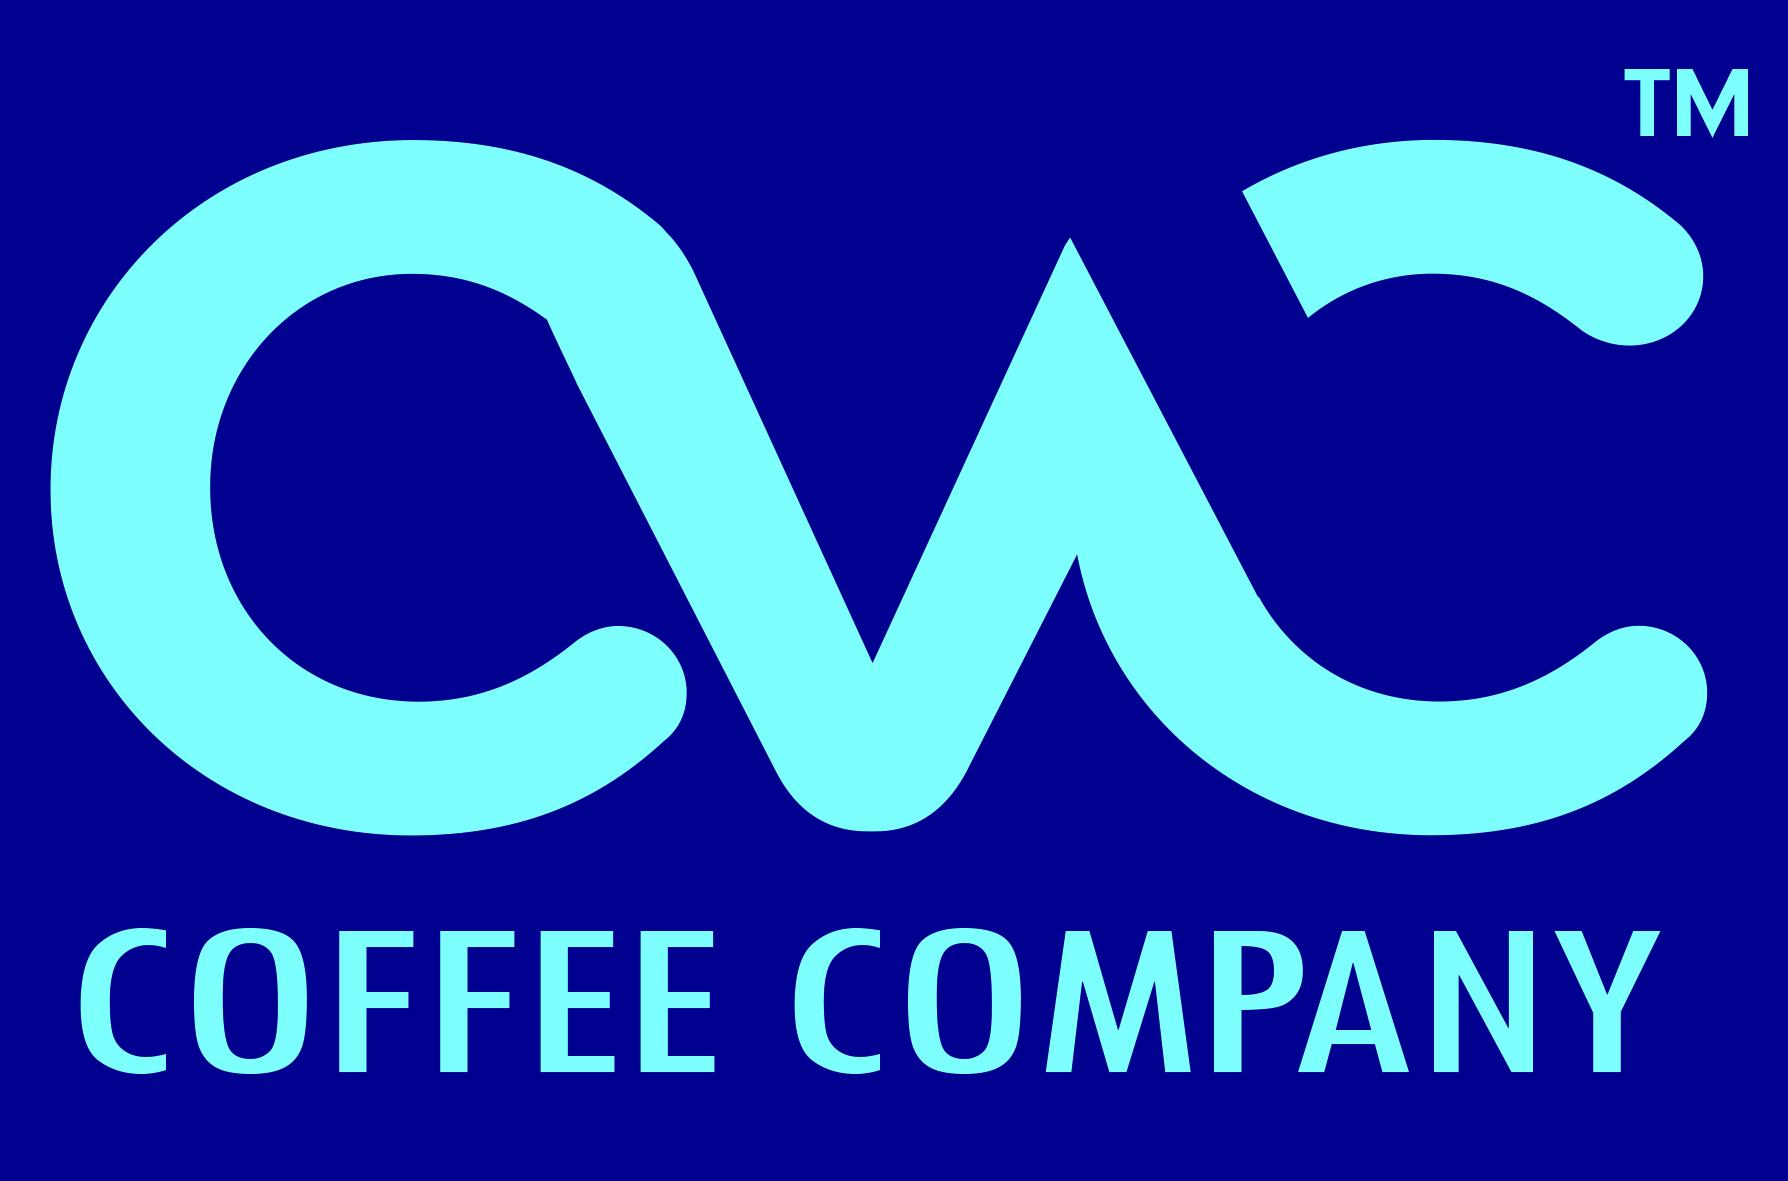 CVC Coffee Company logo